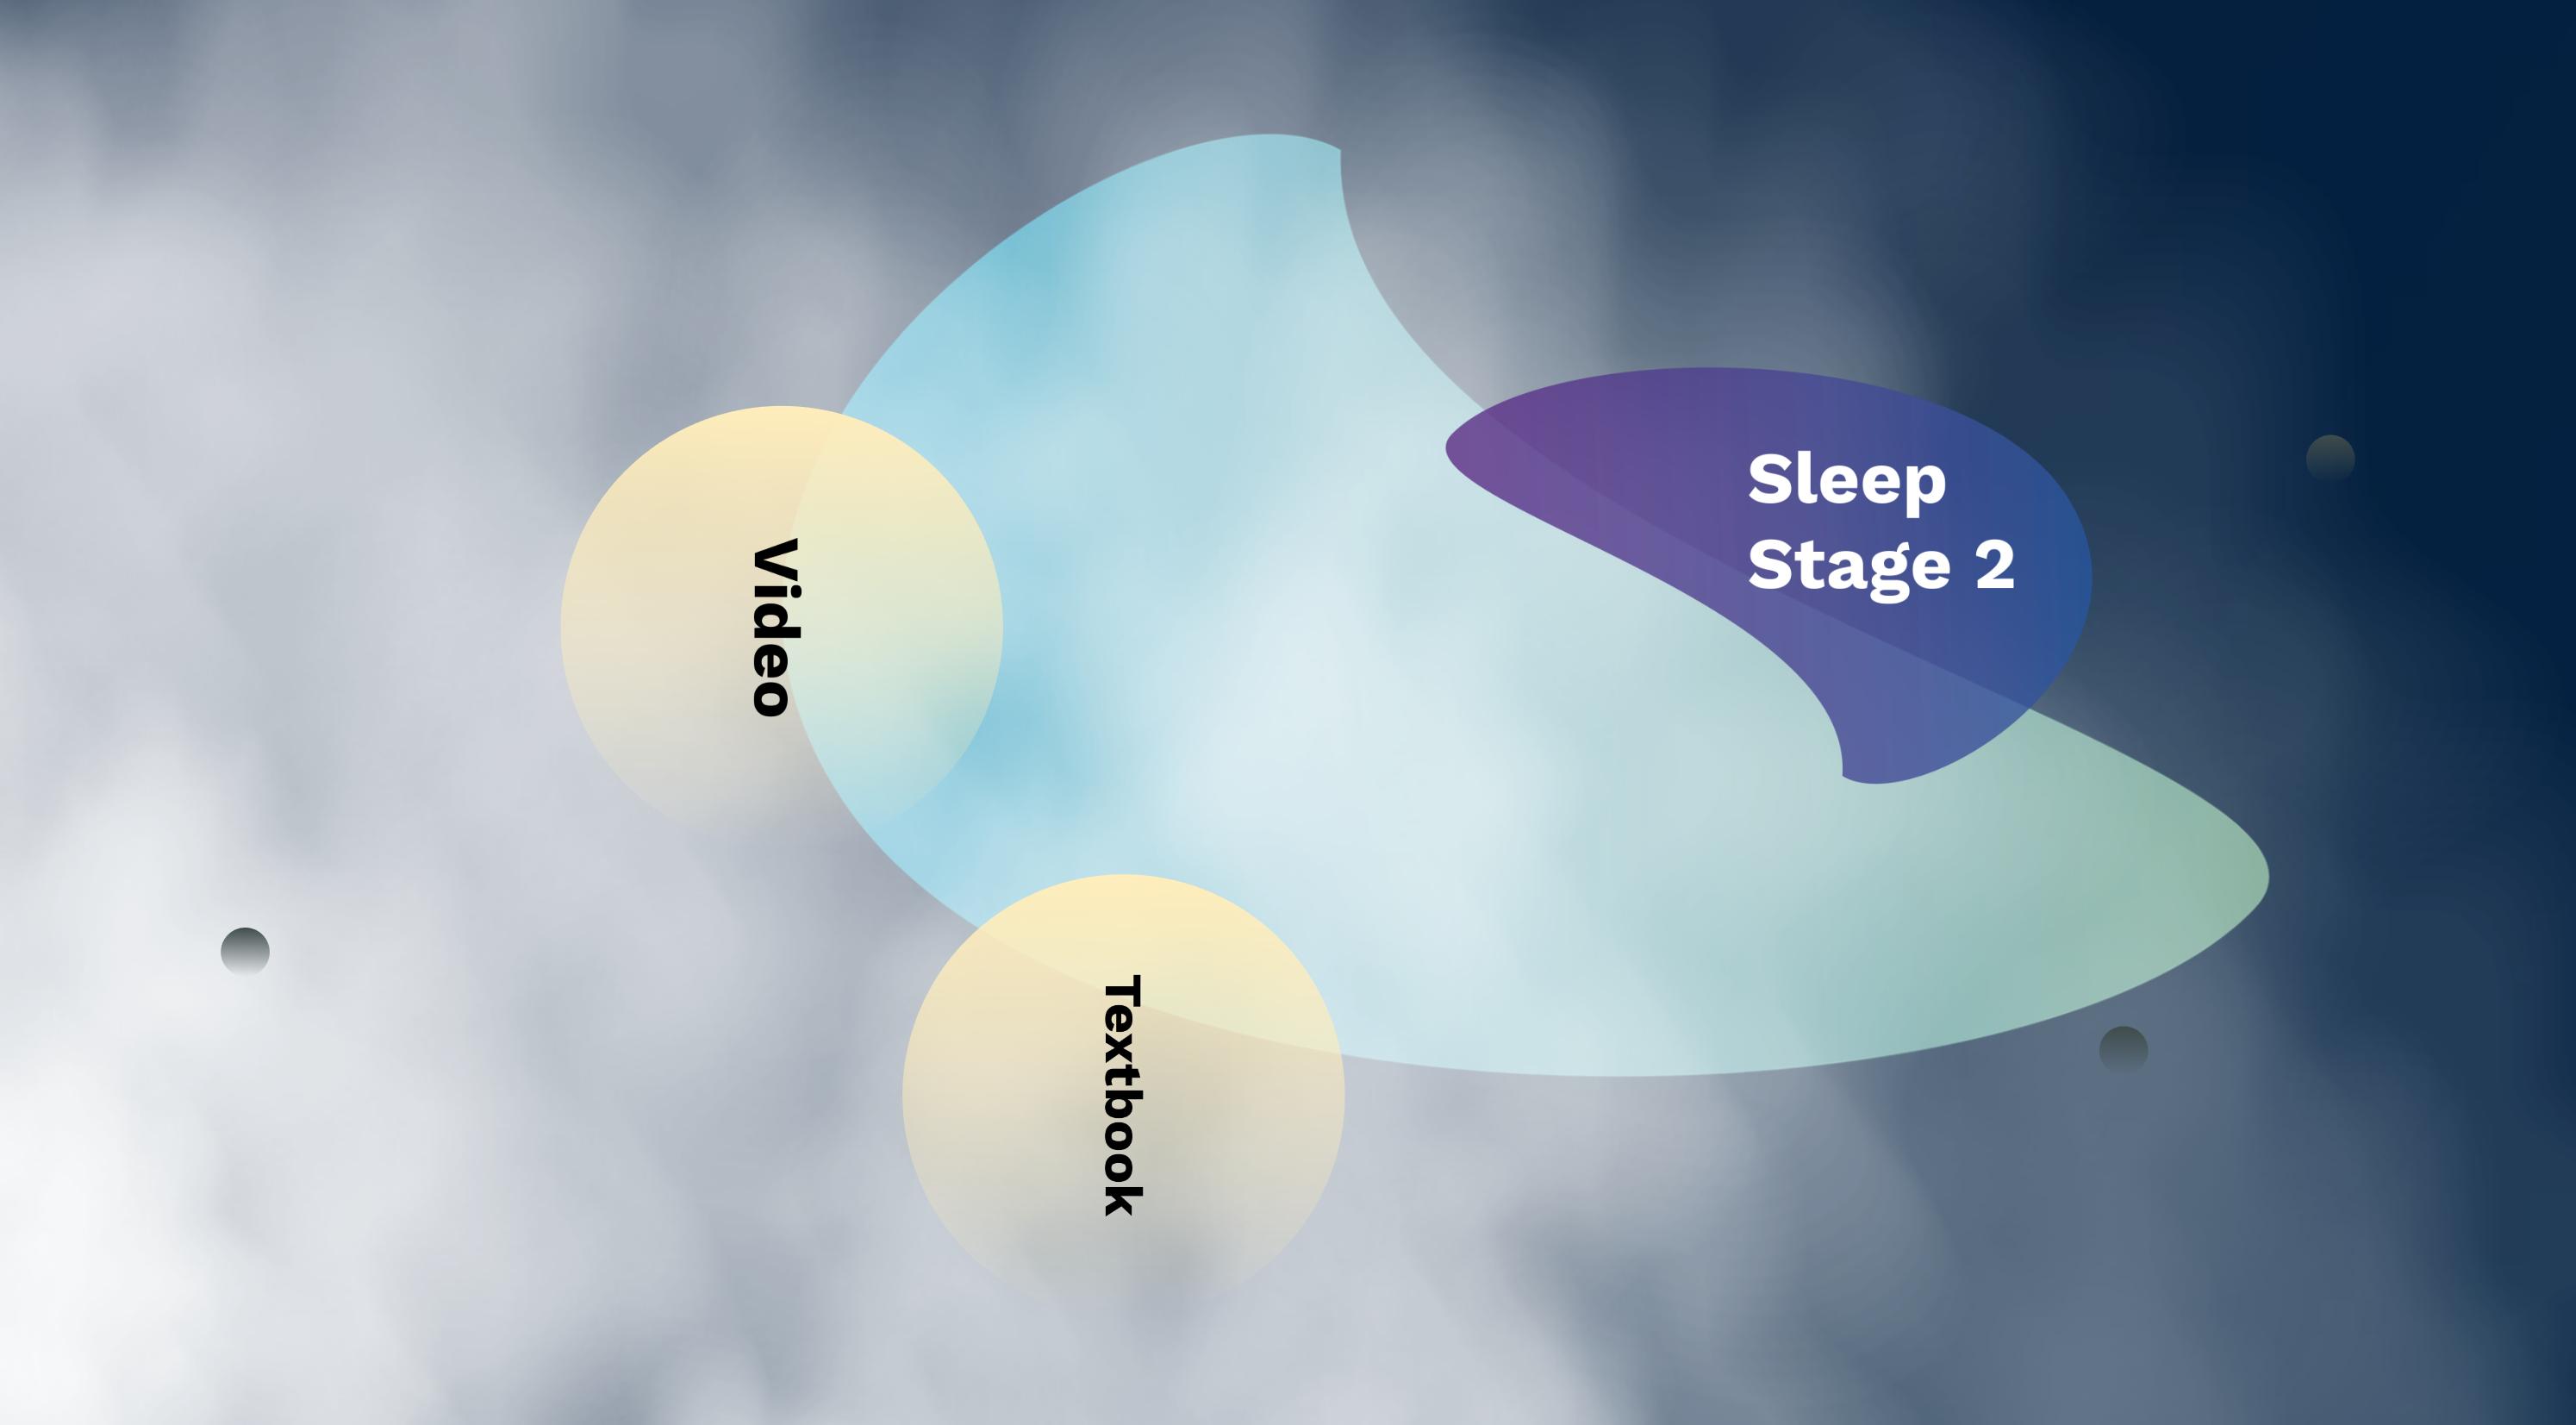 Stage 2 Dreams Psychology Prezi Presentation for BCIT Psyc 1101 | Monika Szucs